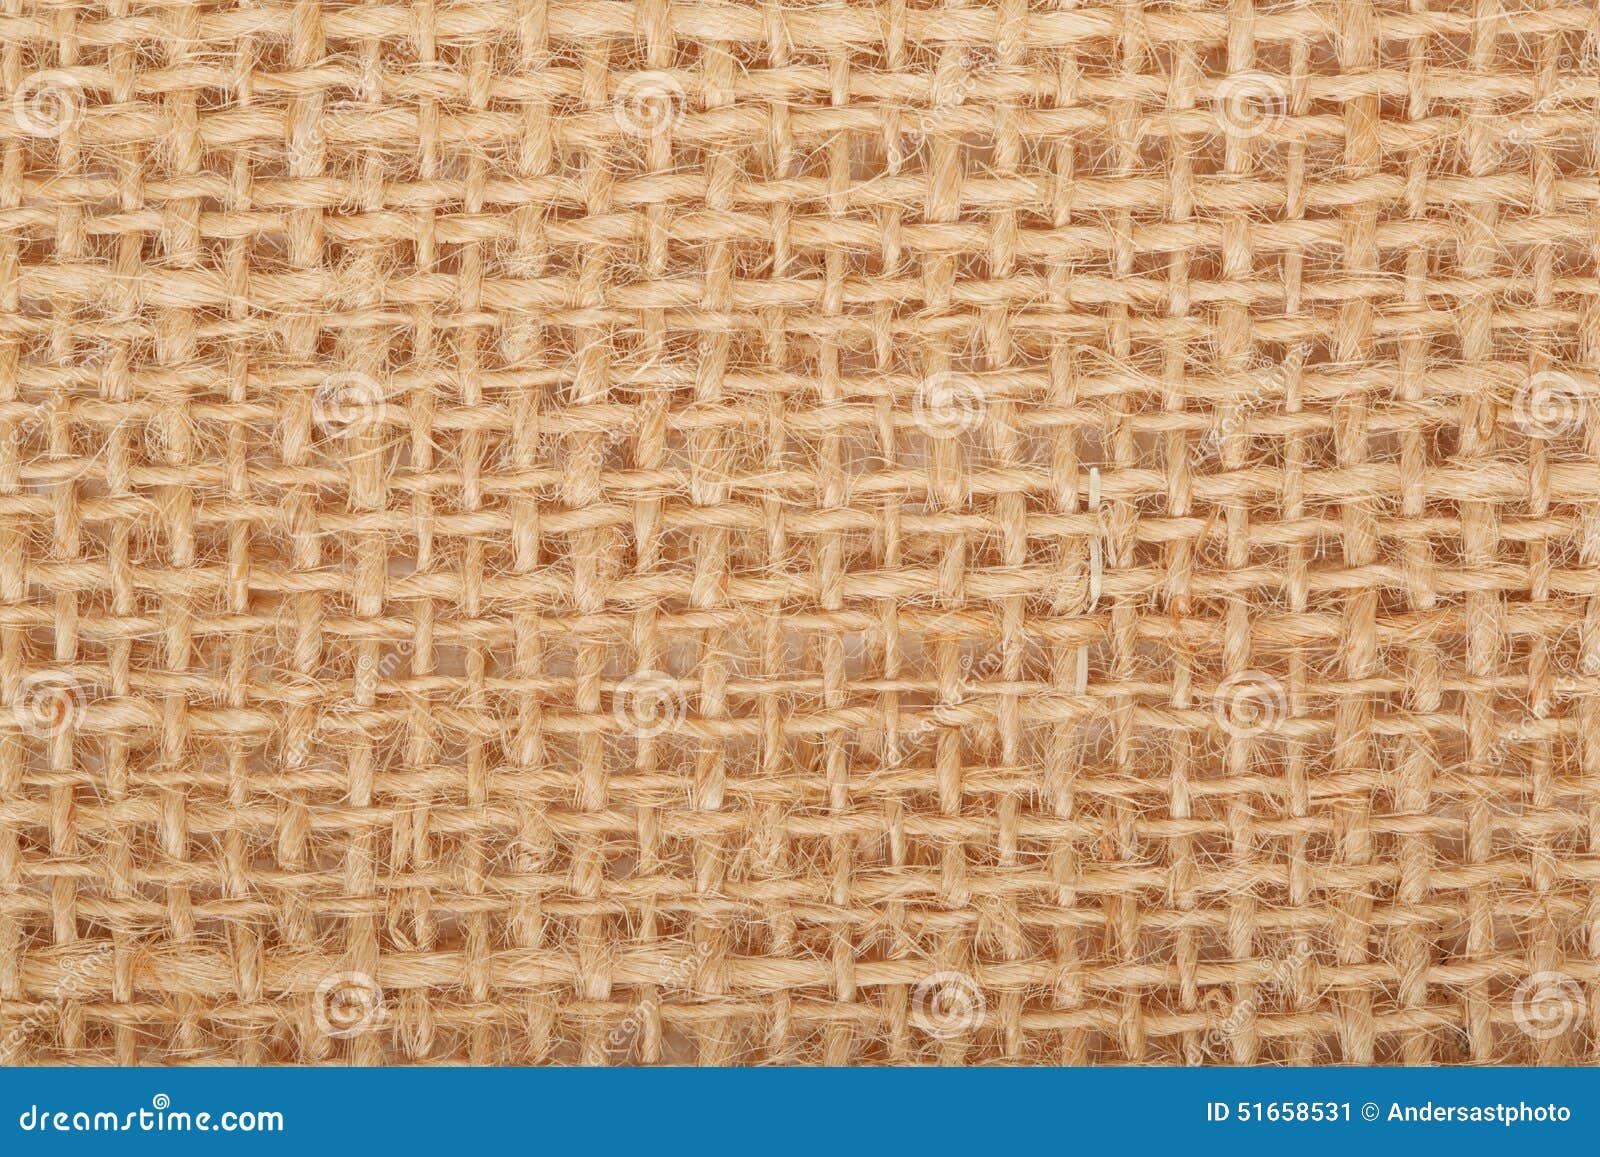 brown burlap texture background - photo #49